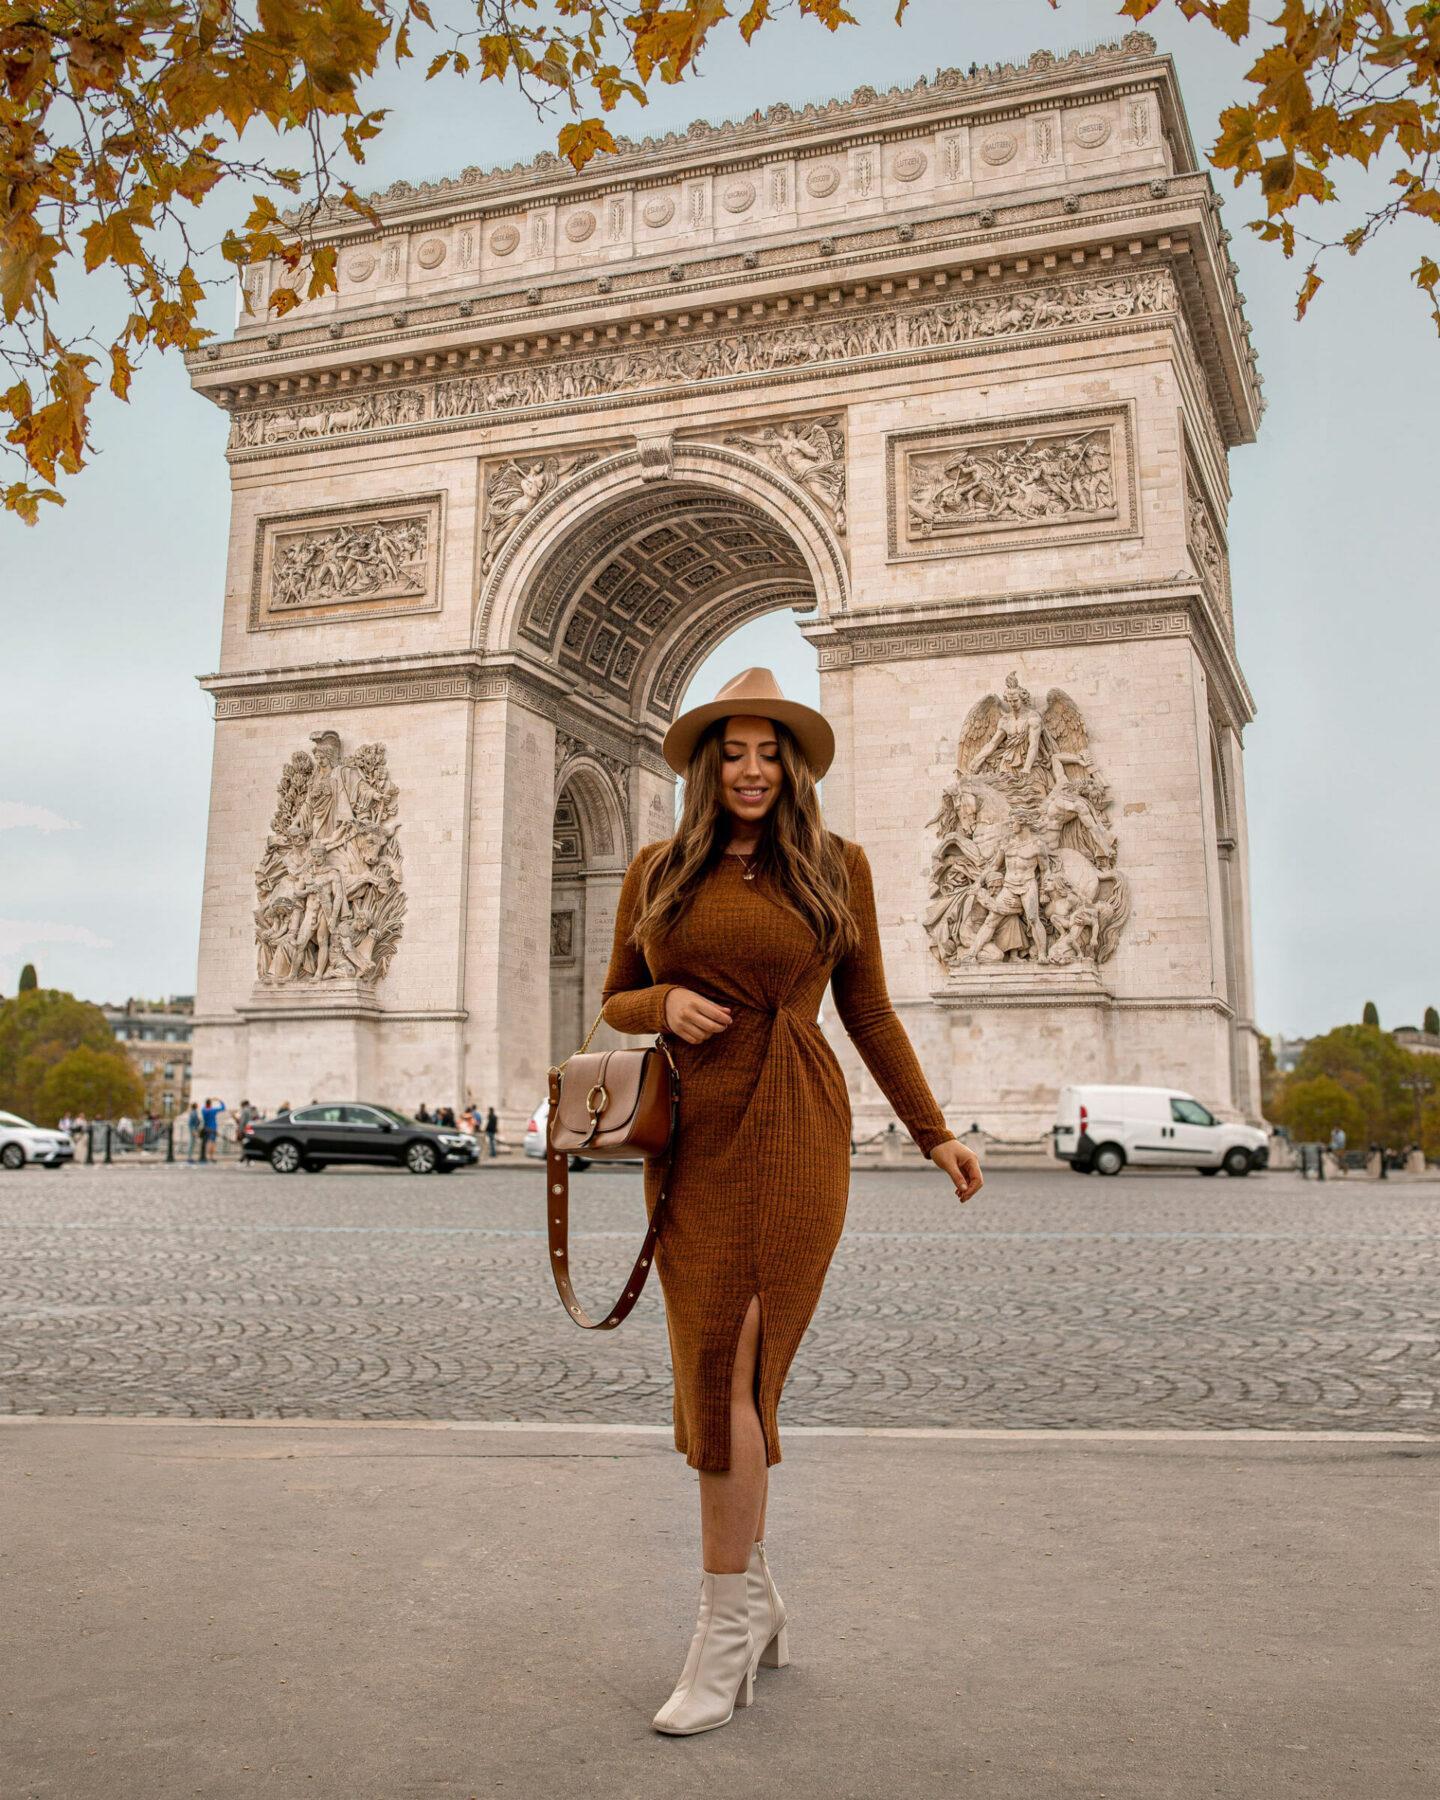 Paris Instagrammable Locations kelseyinlondon kelsey heinrichs things to do in Paris bucketlist Arc de Triomphe